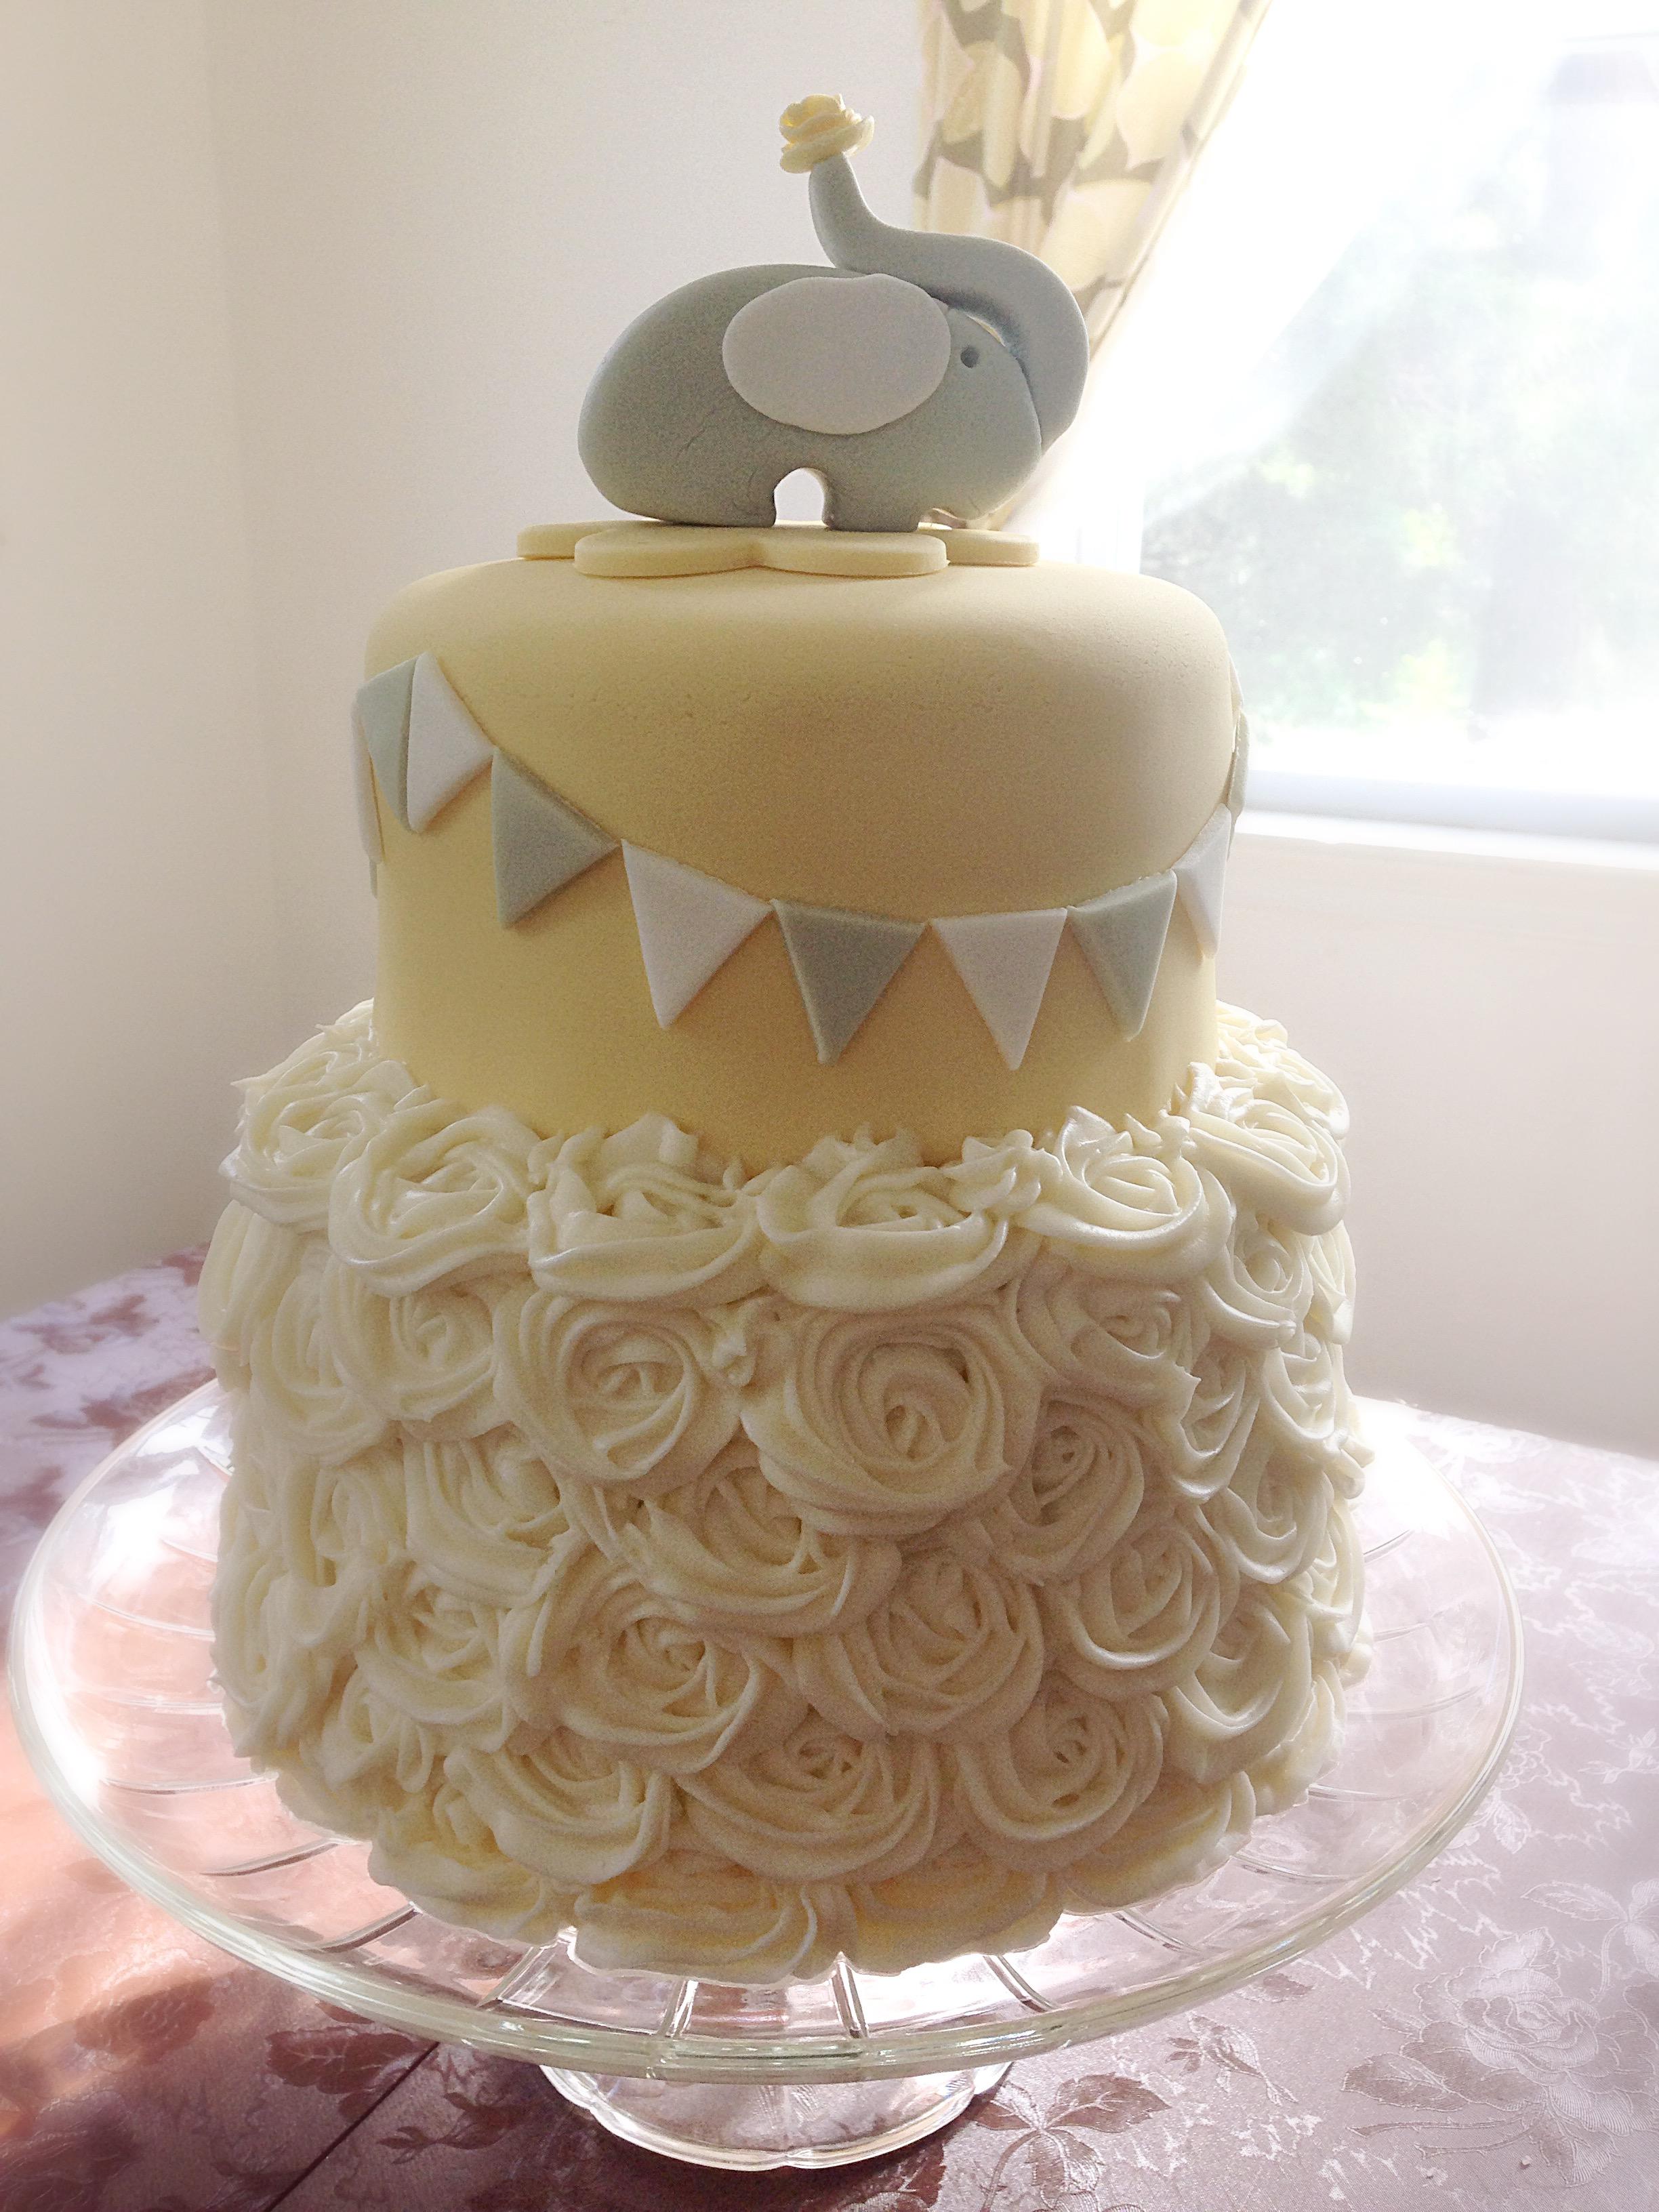 Elephant.cake.JPG